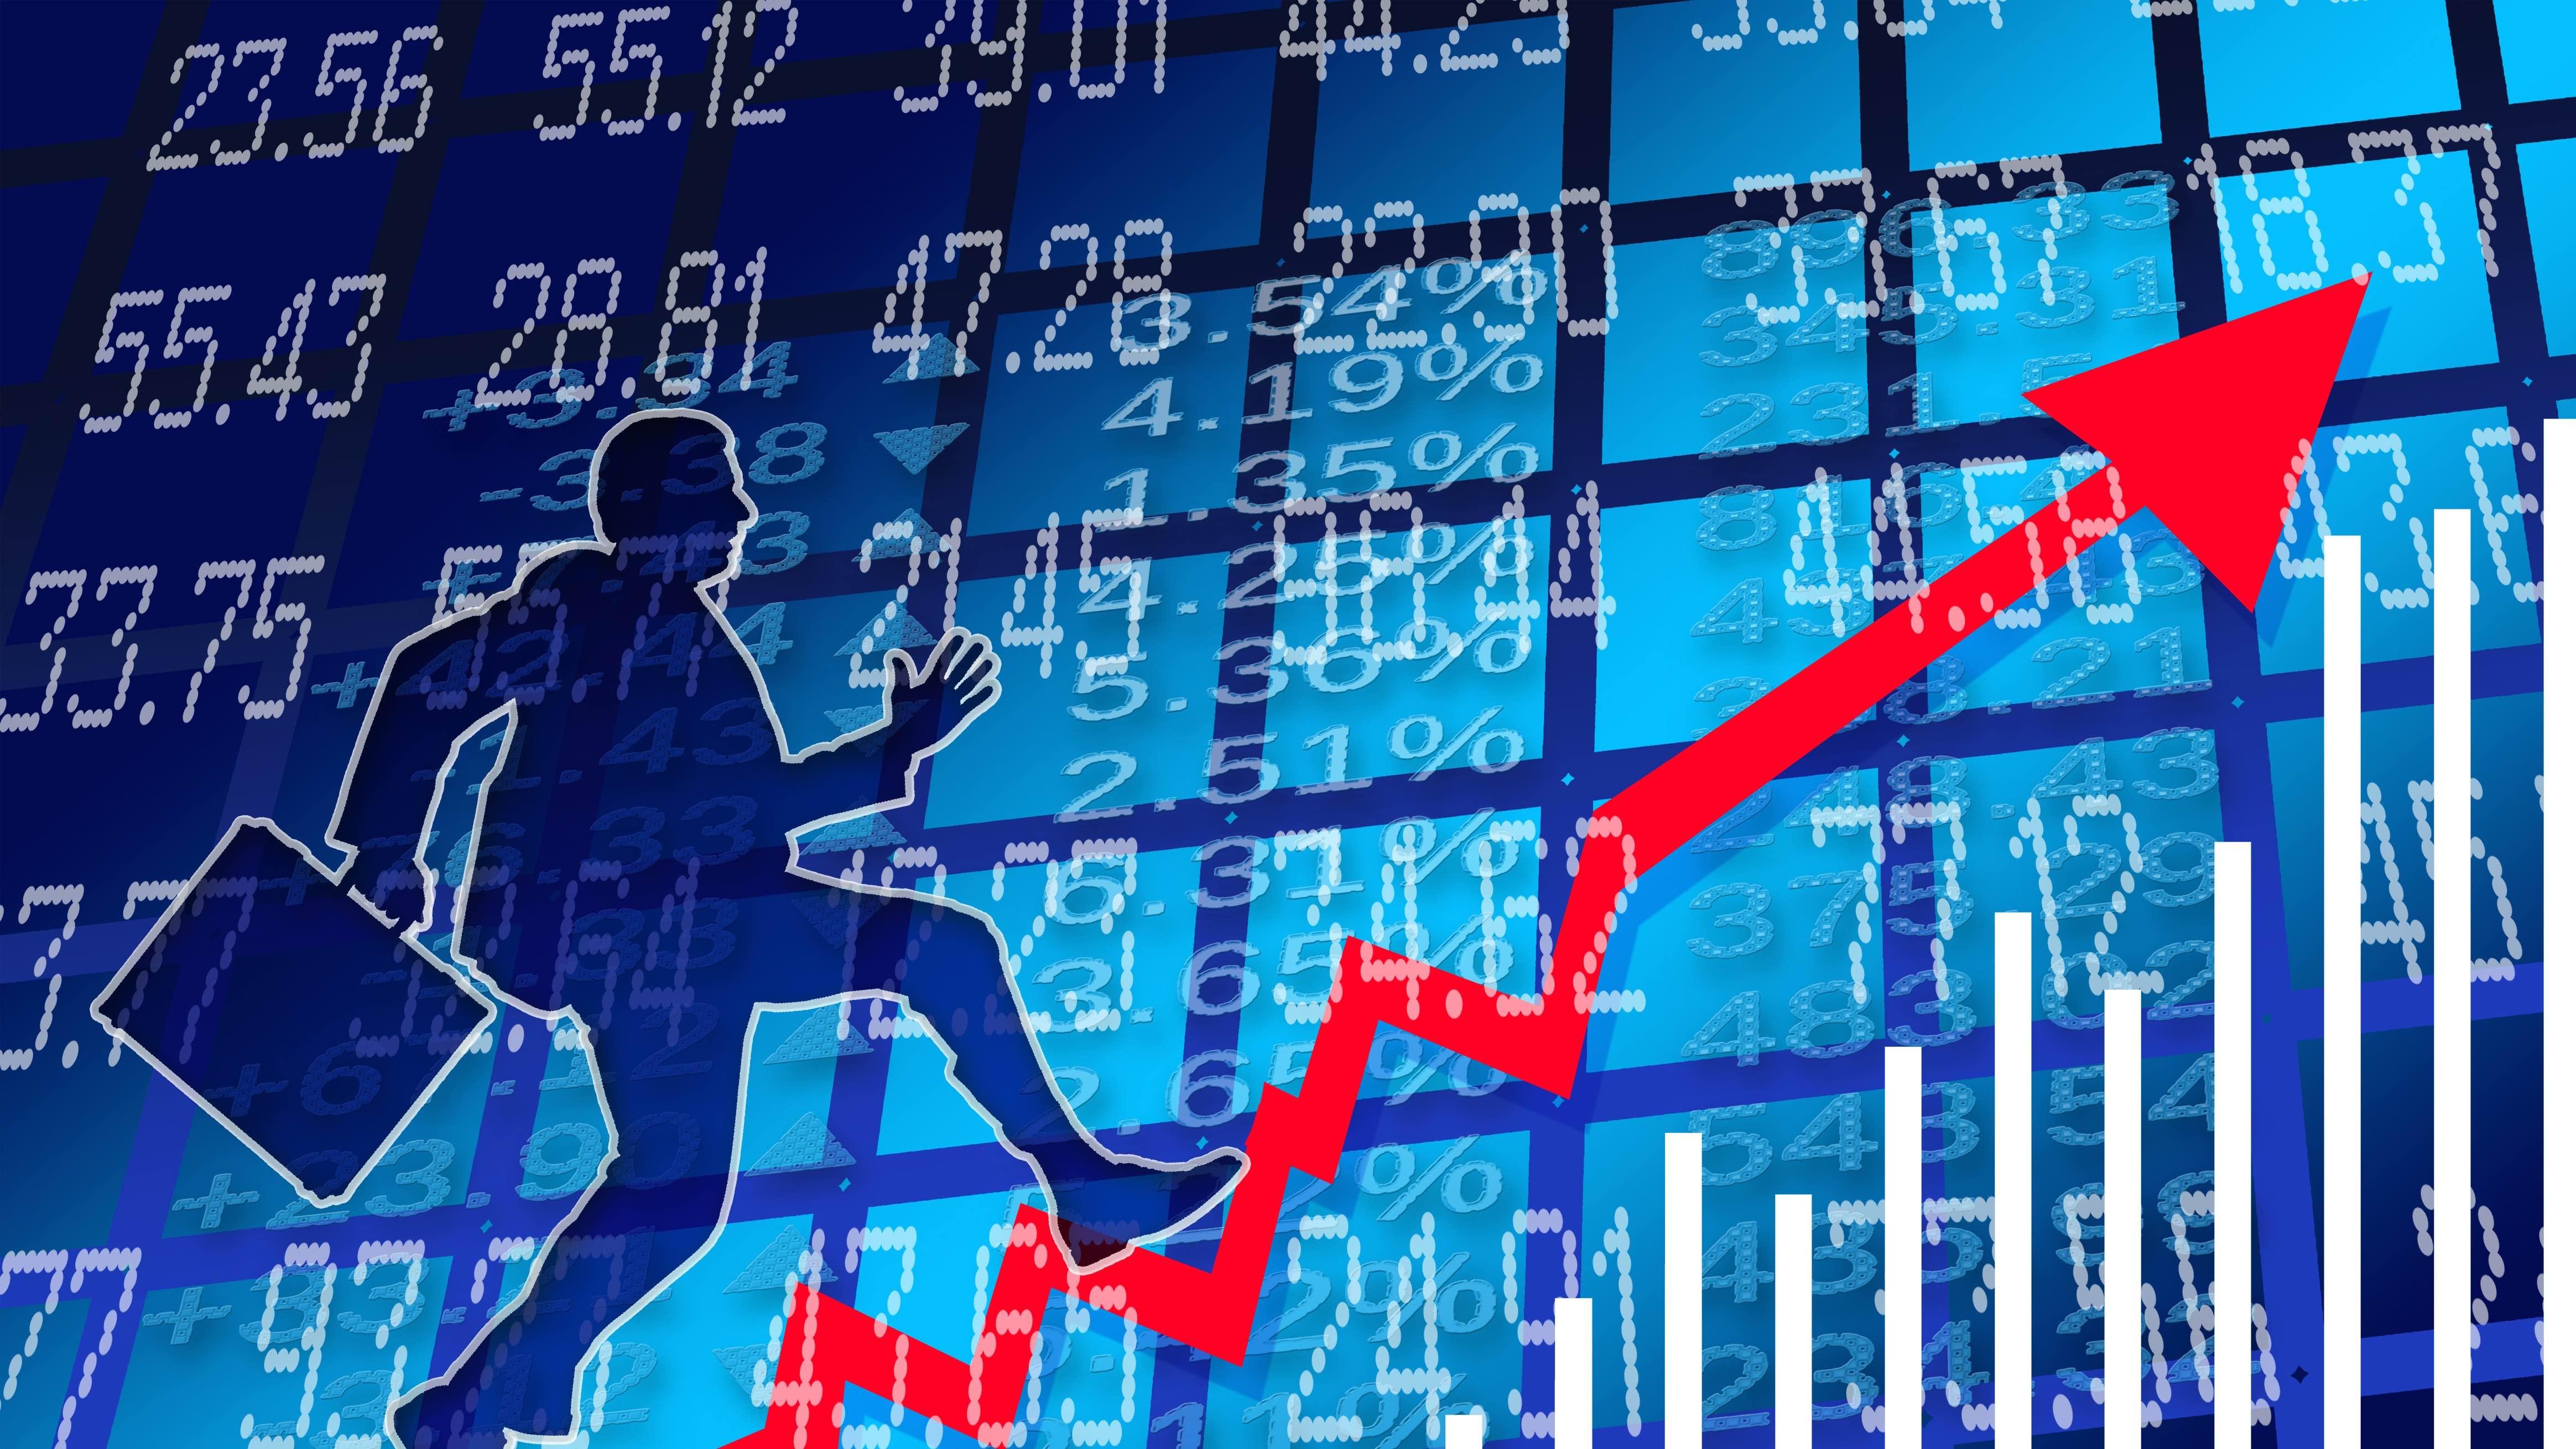 gute aktien planspiel börse